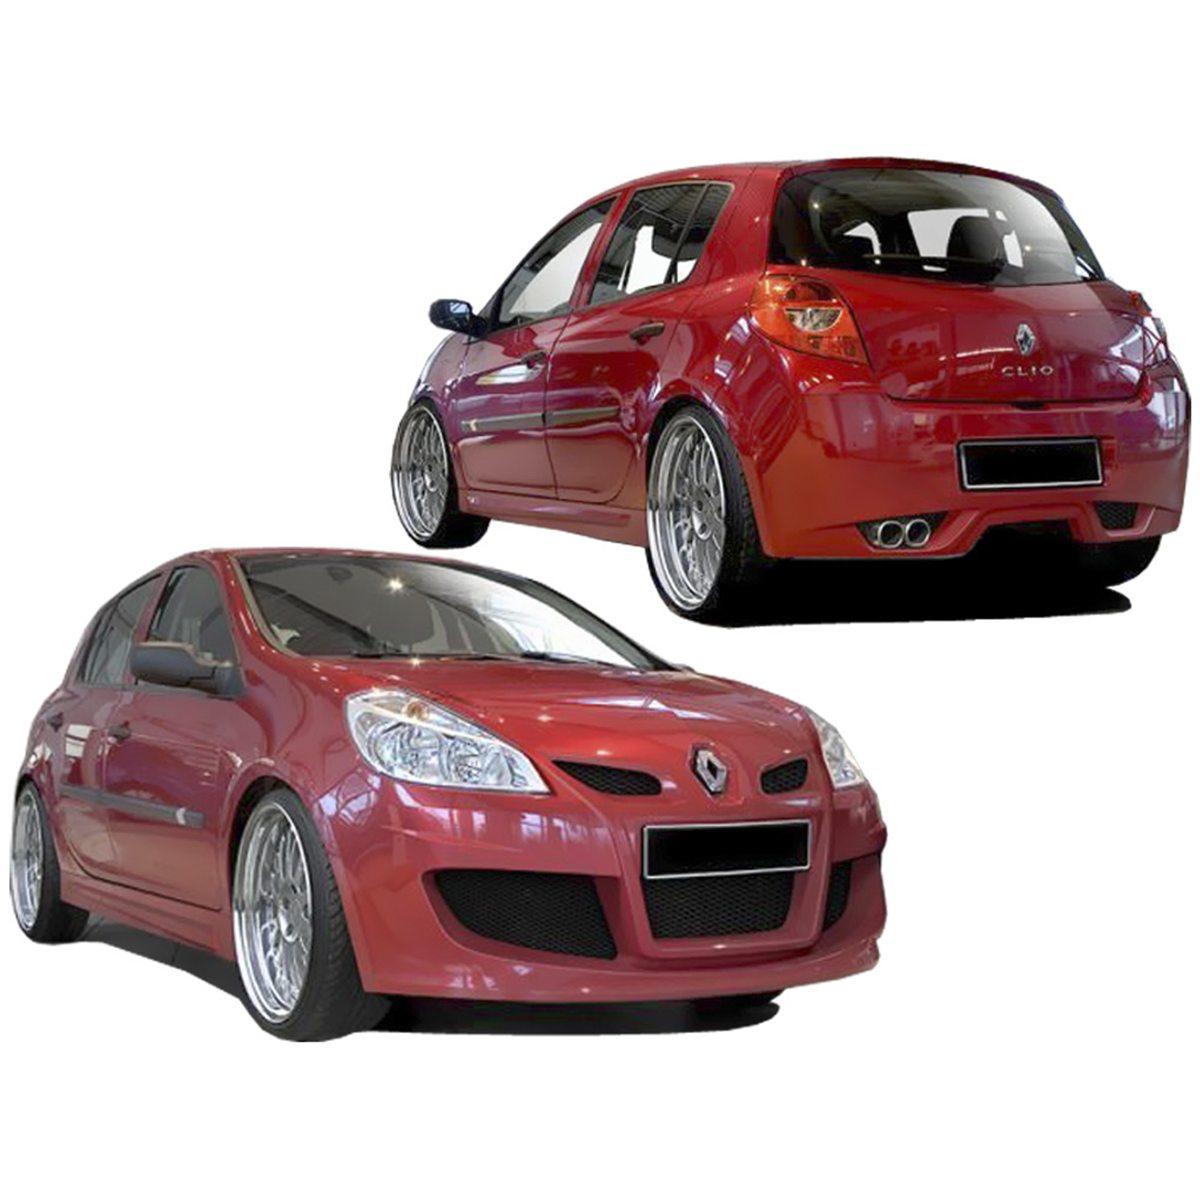 Renault-Clio-06-Space-KIT-KTS090